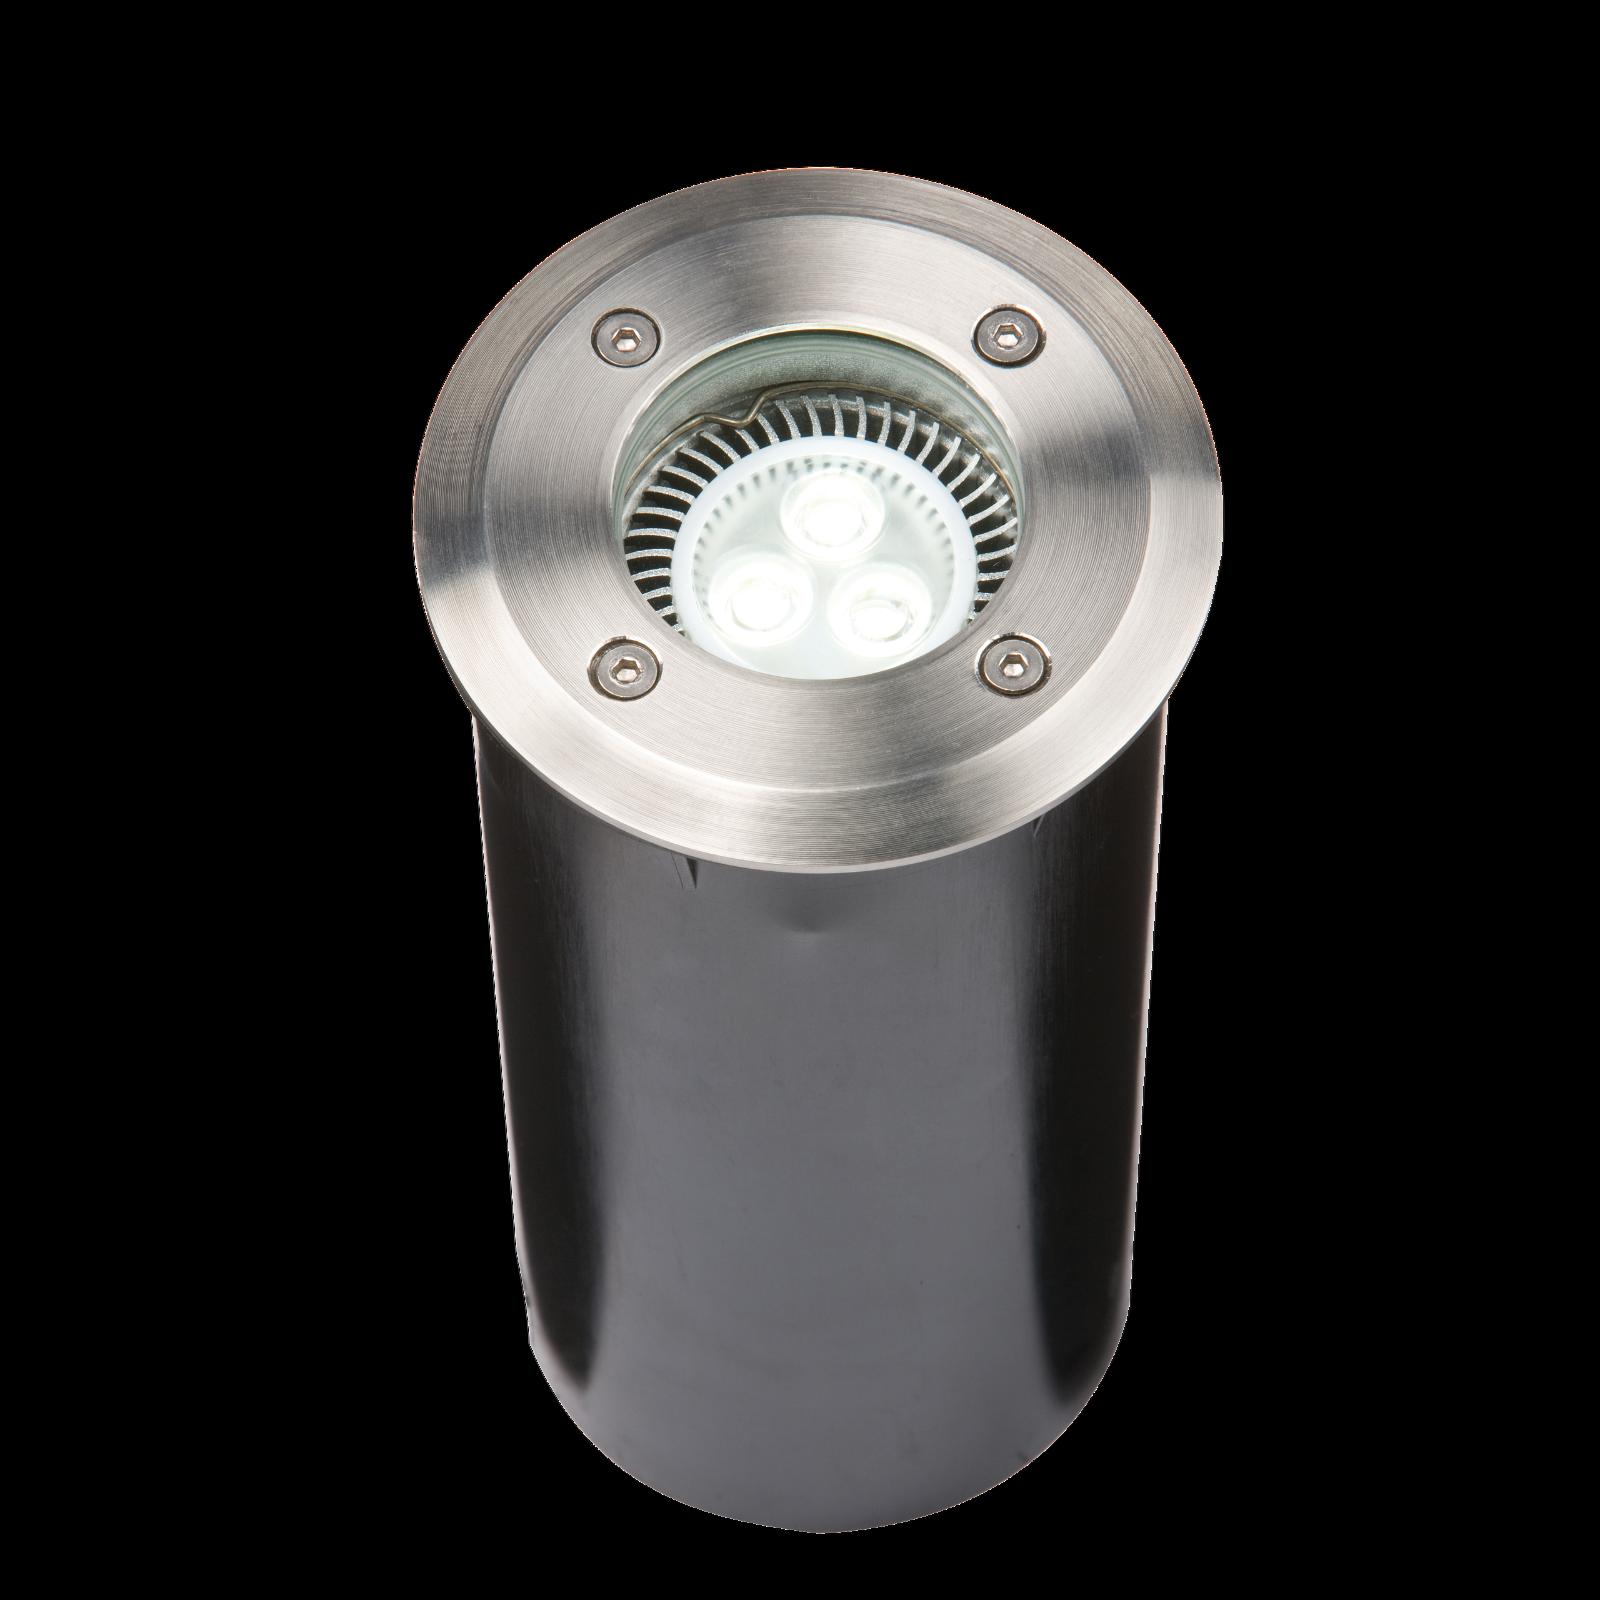 IP67 230V GU10 Acciaio Inox rossoondo a terra luce regolabile WALKOVER corpo di lunga